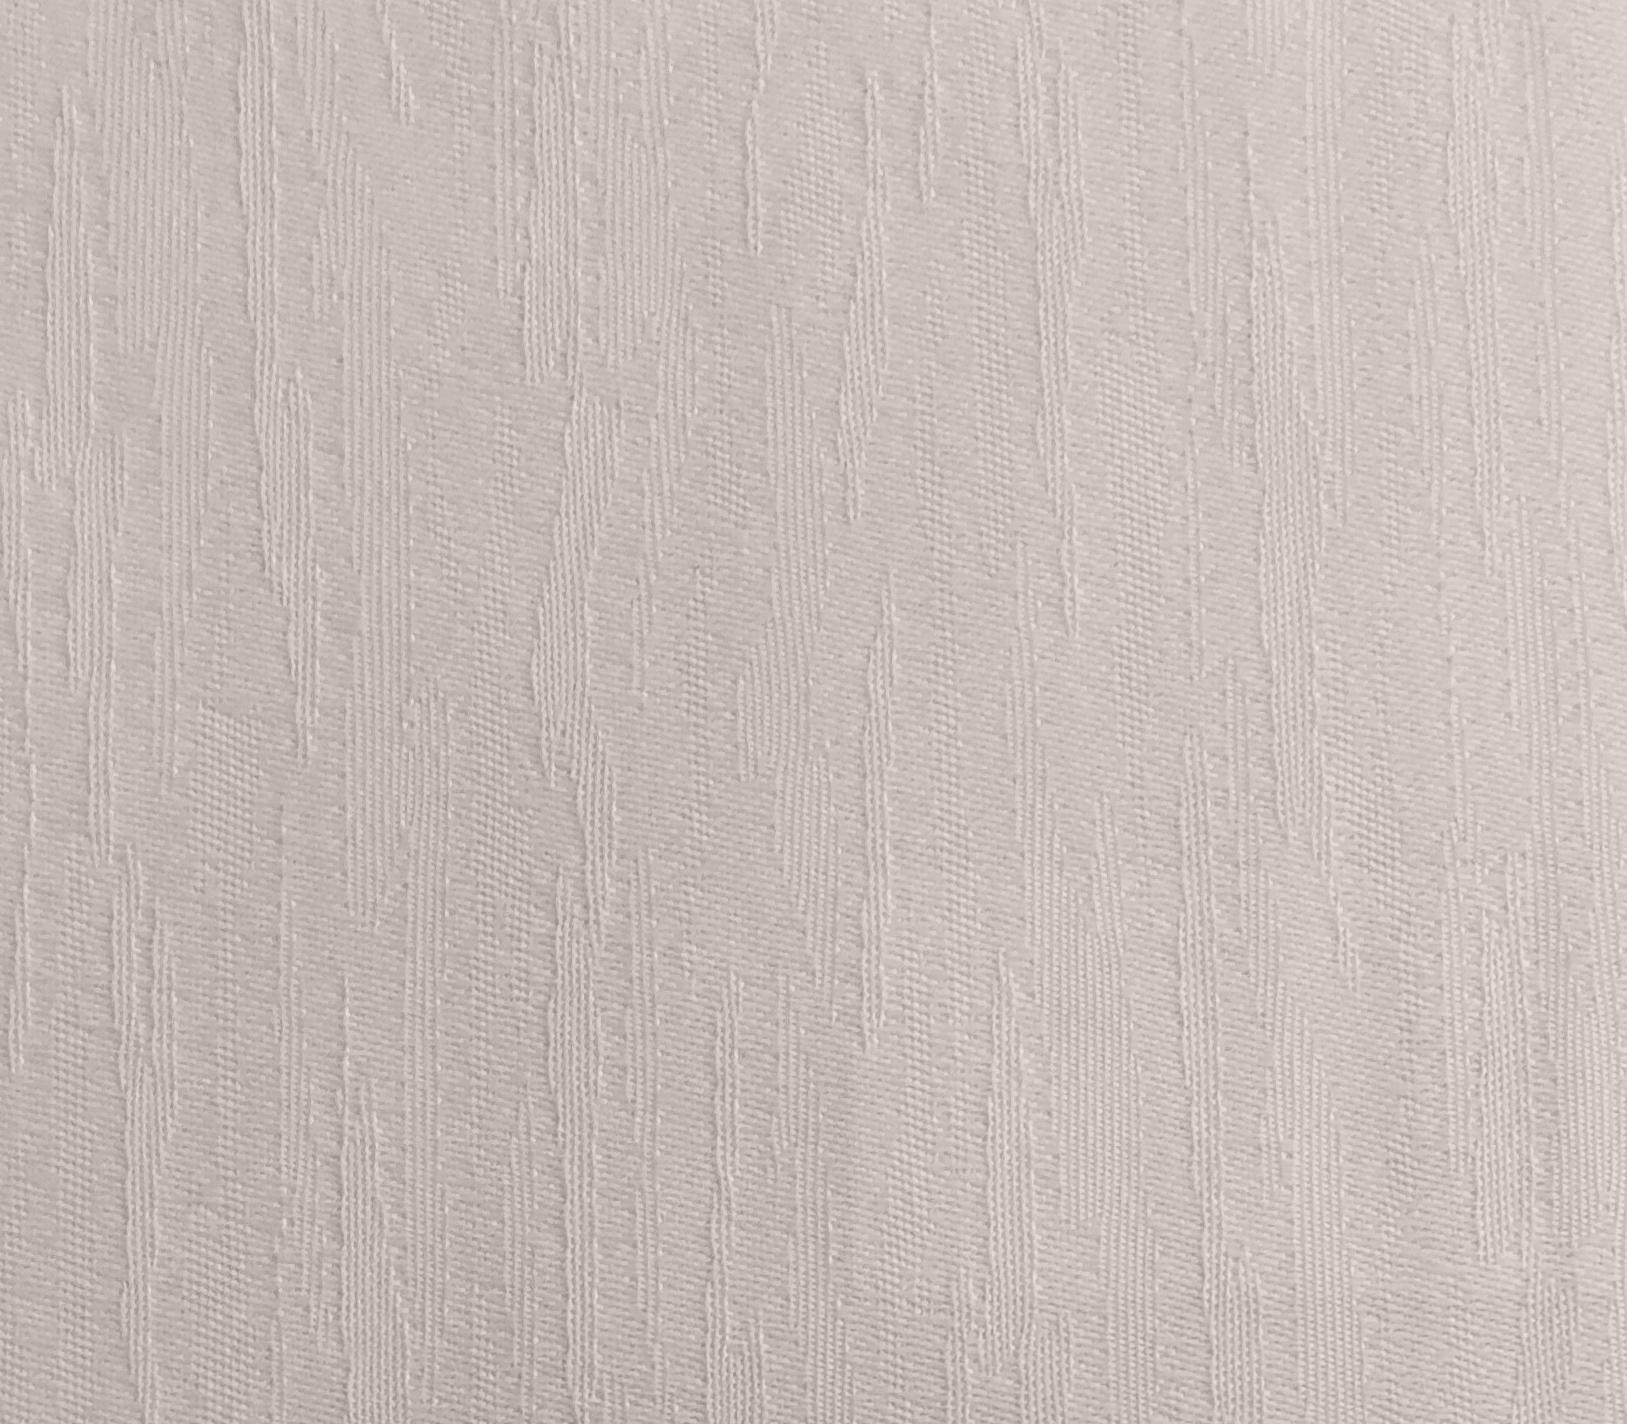 Ventura Buttermilk Blind Sample Fabric